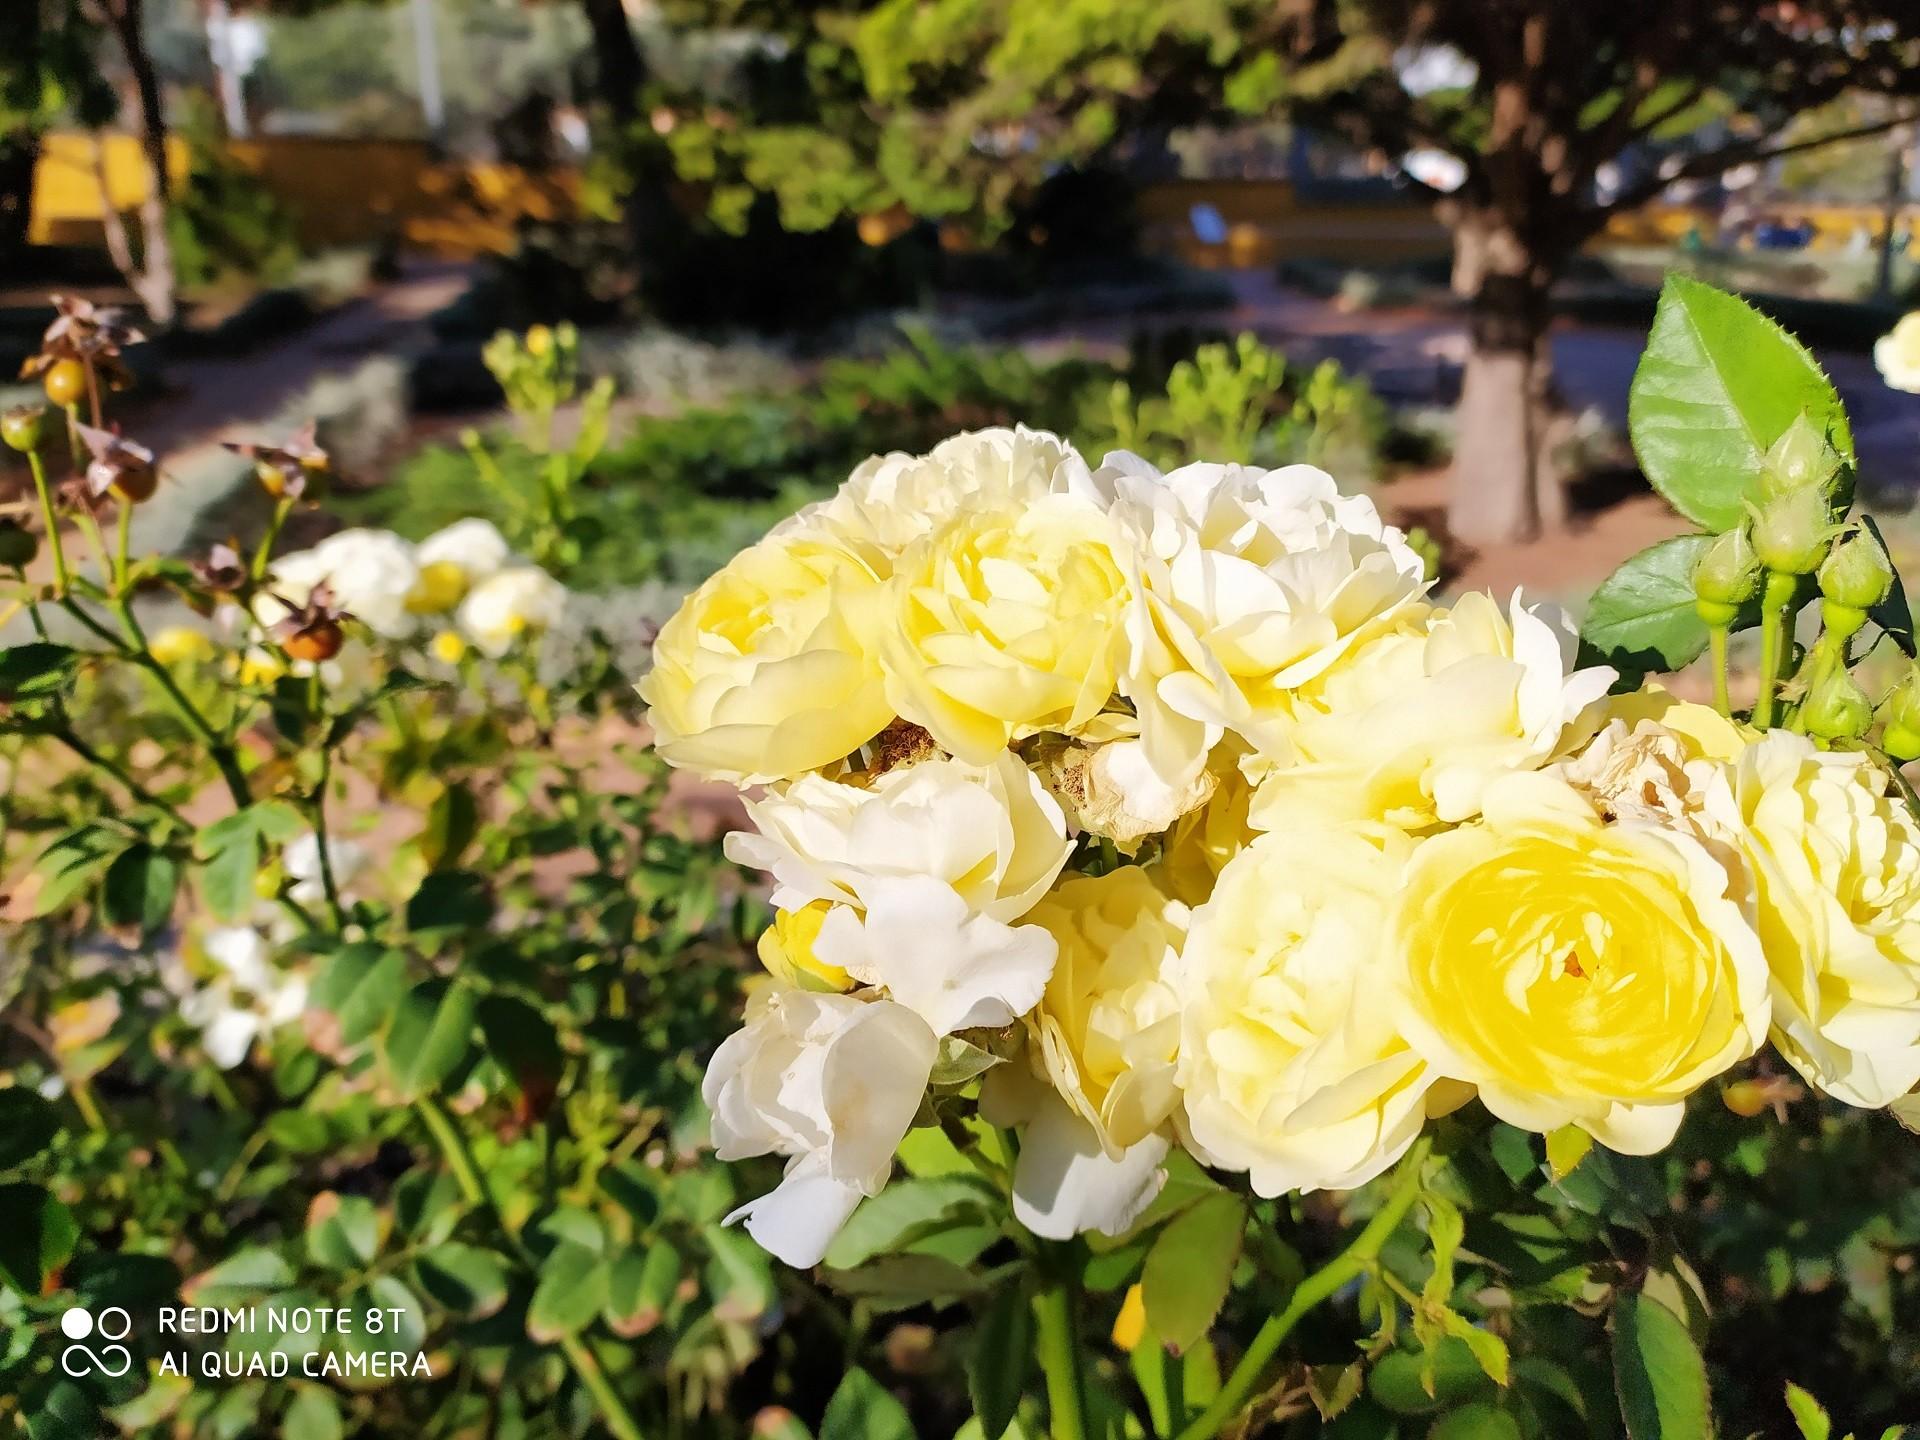 Redmi Note 8T flowers 1